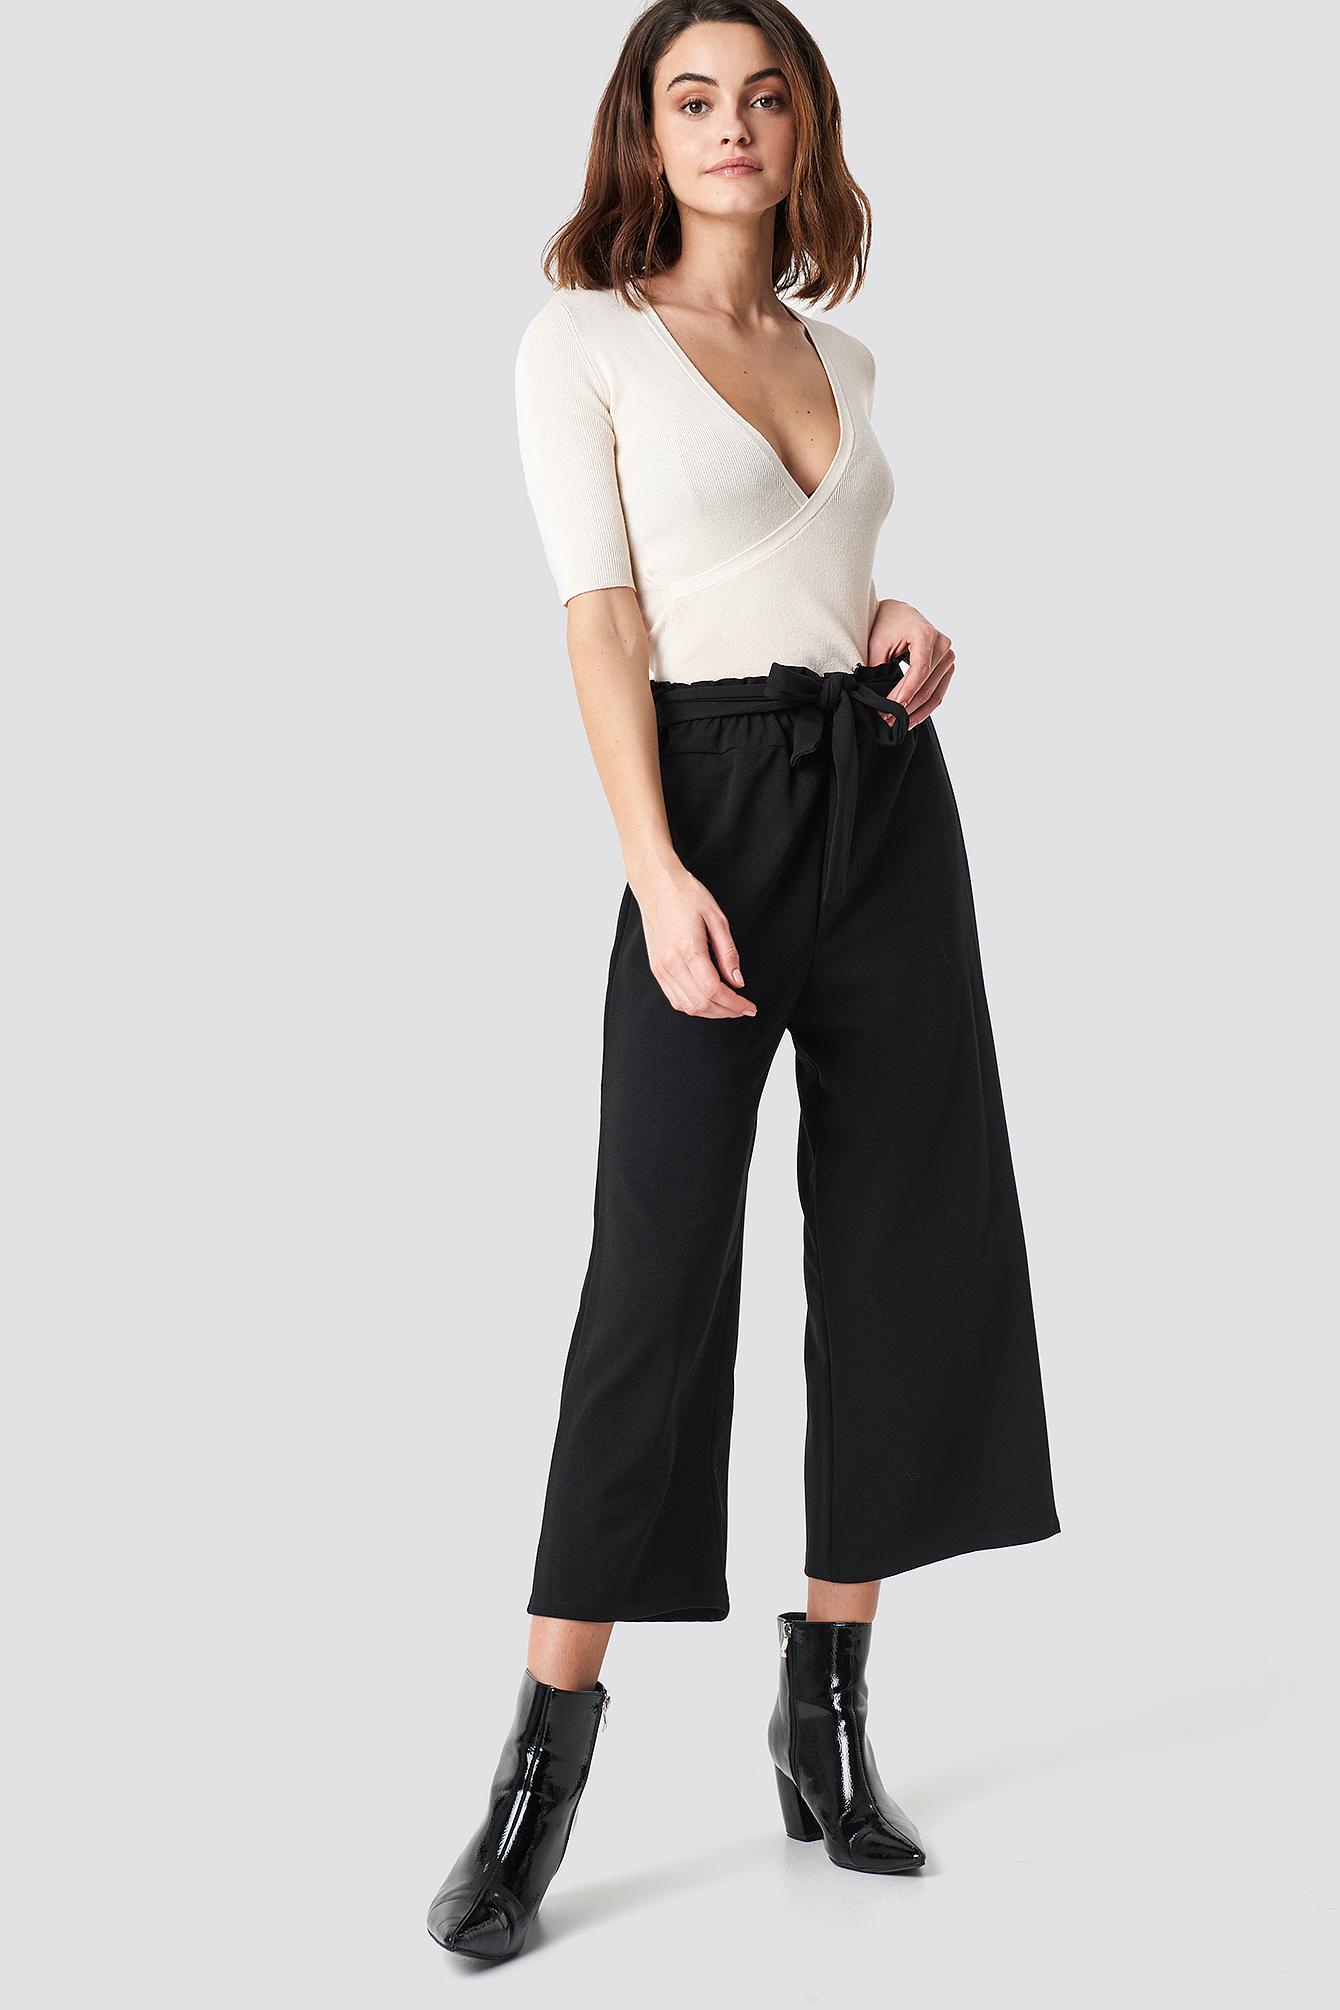 sisters point -  Noto Pants - Black